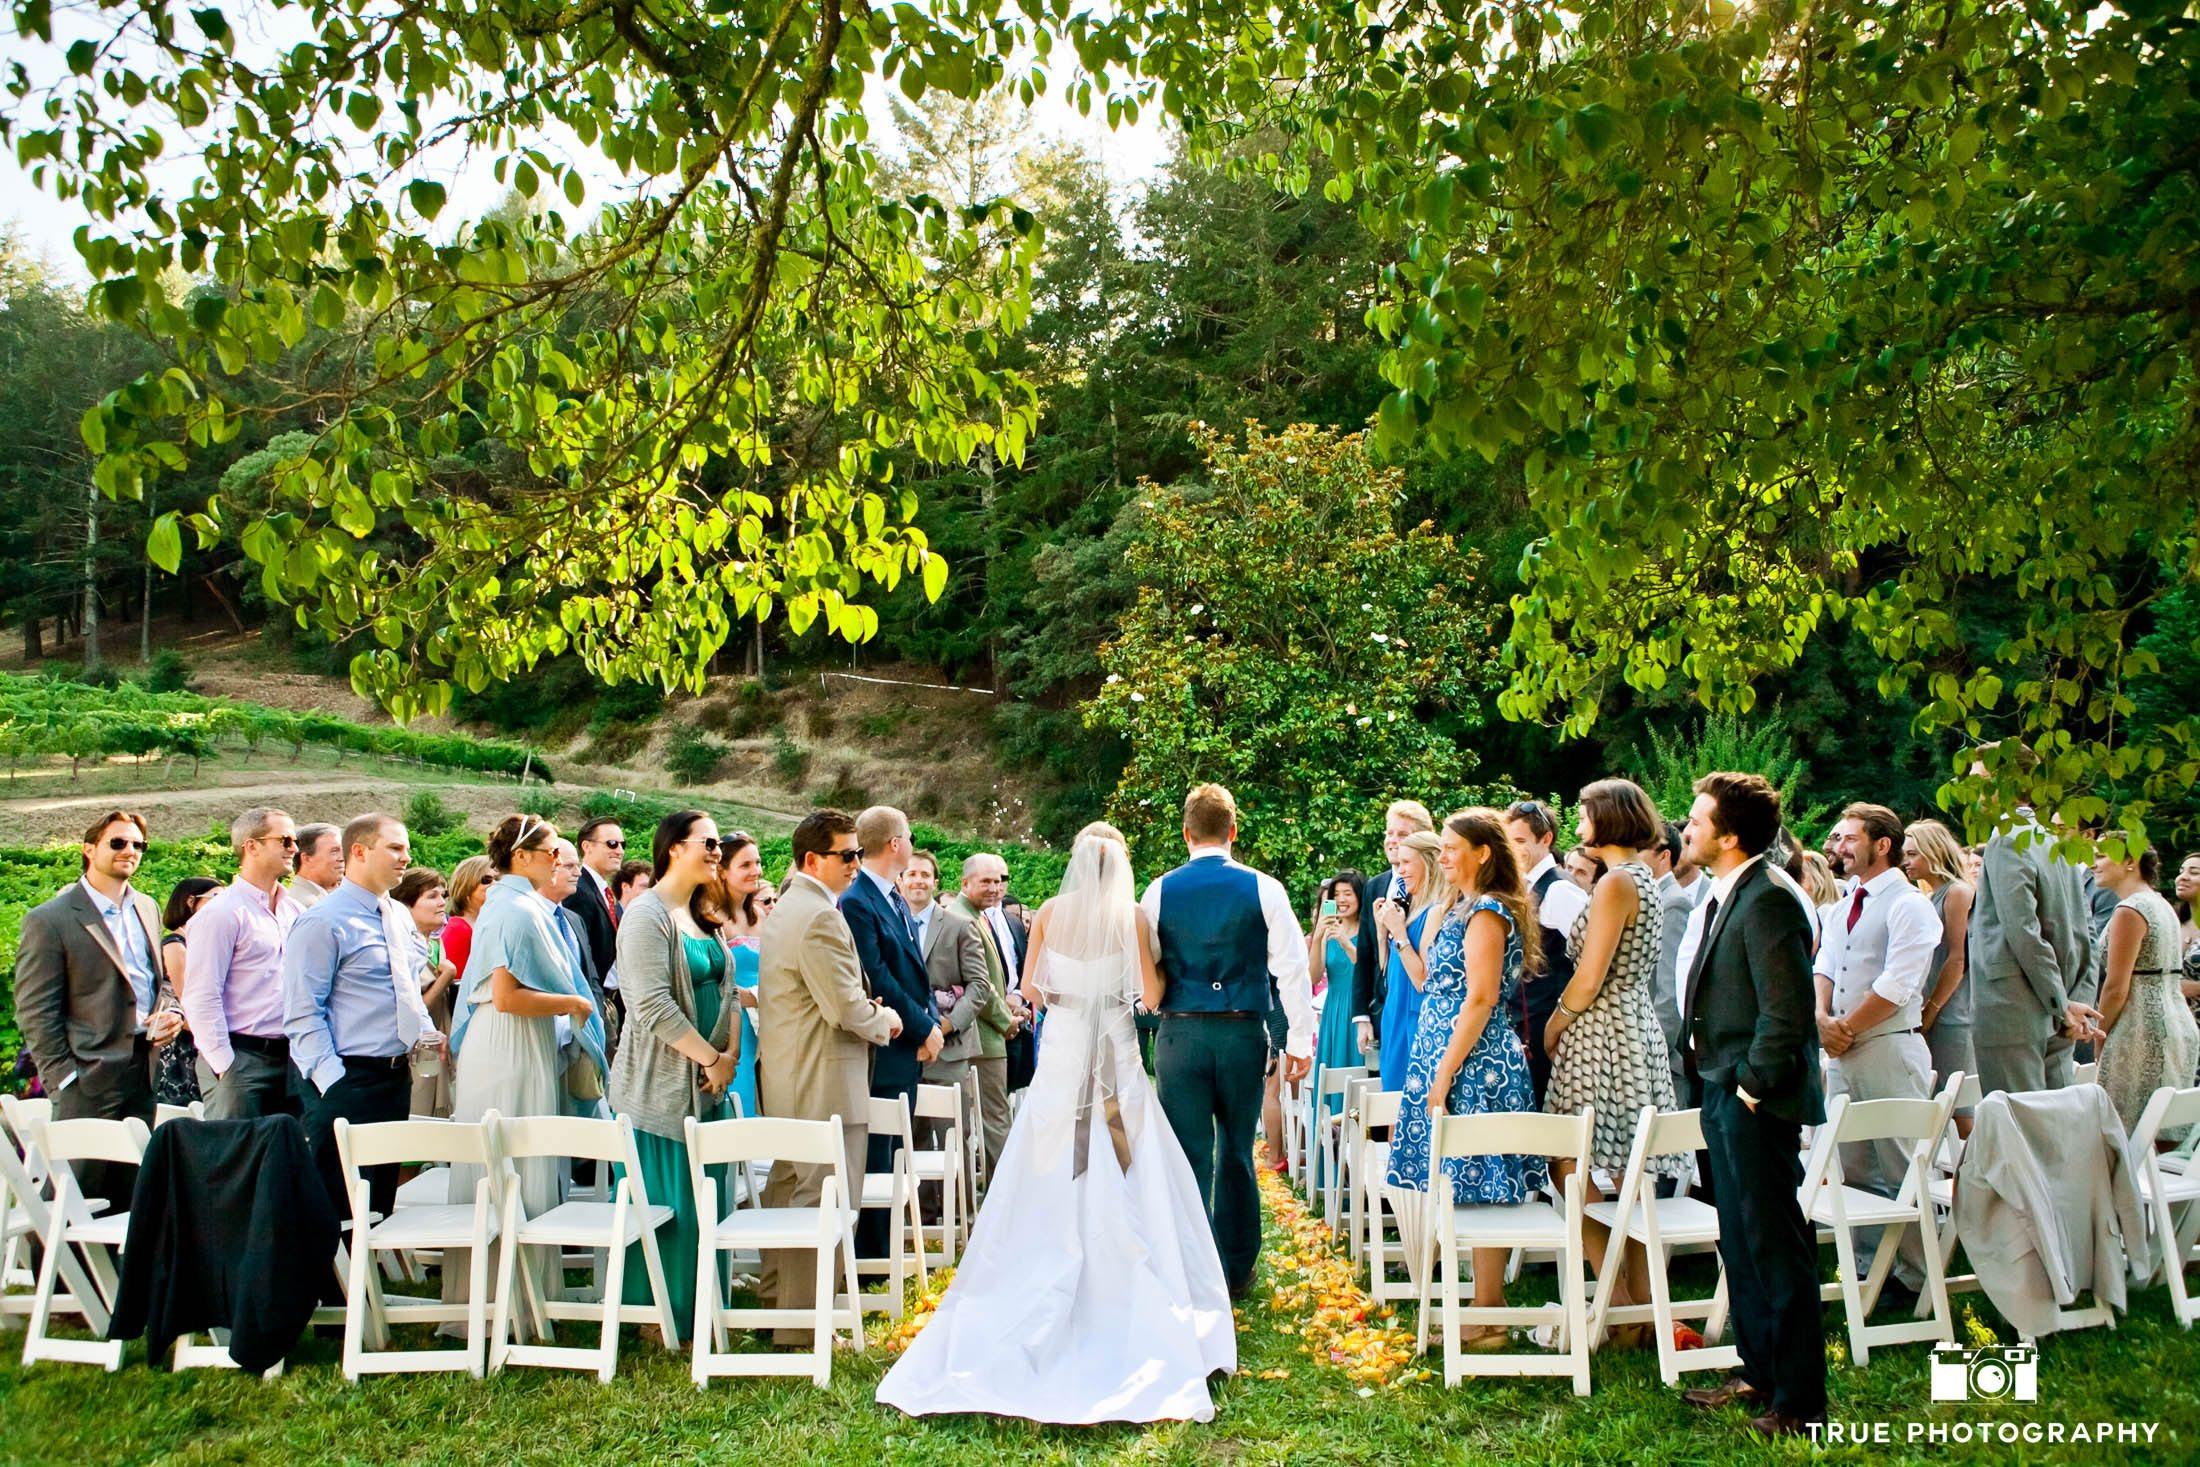 Bride and Groom walk down aisle together at vineyard